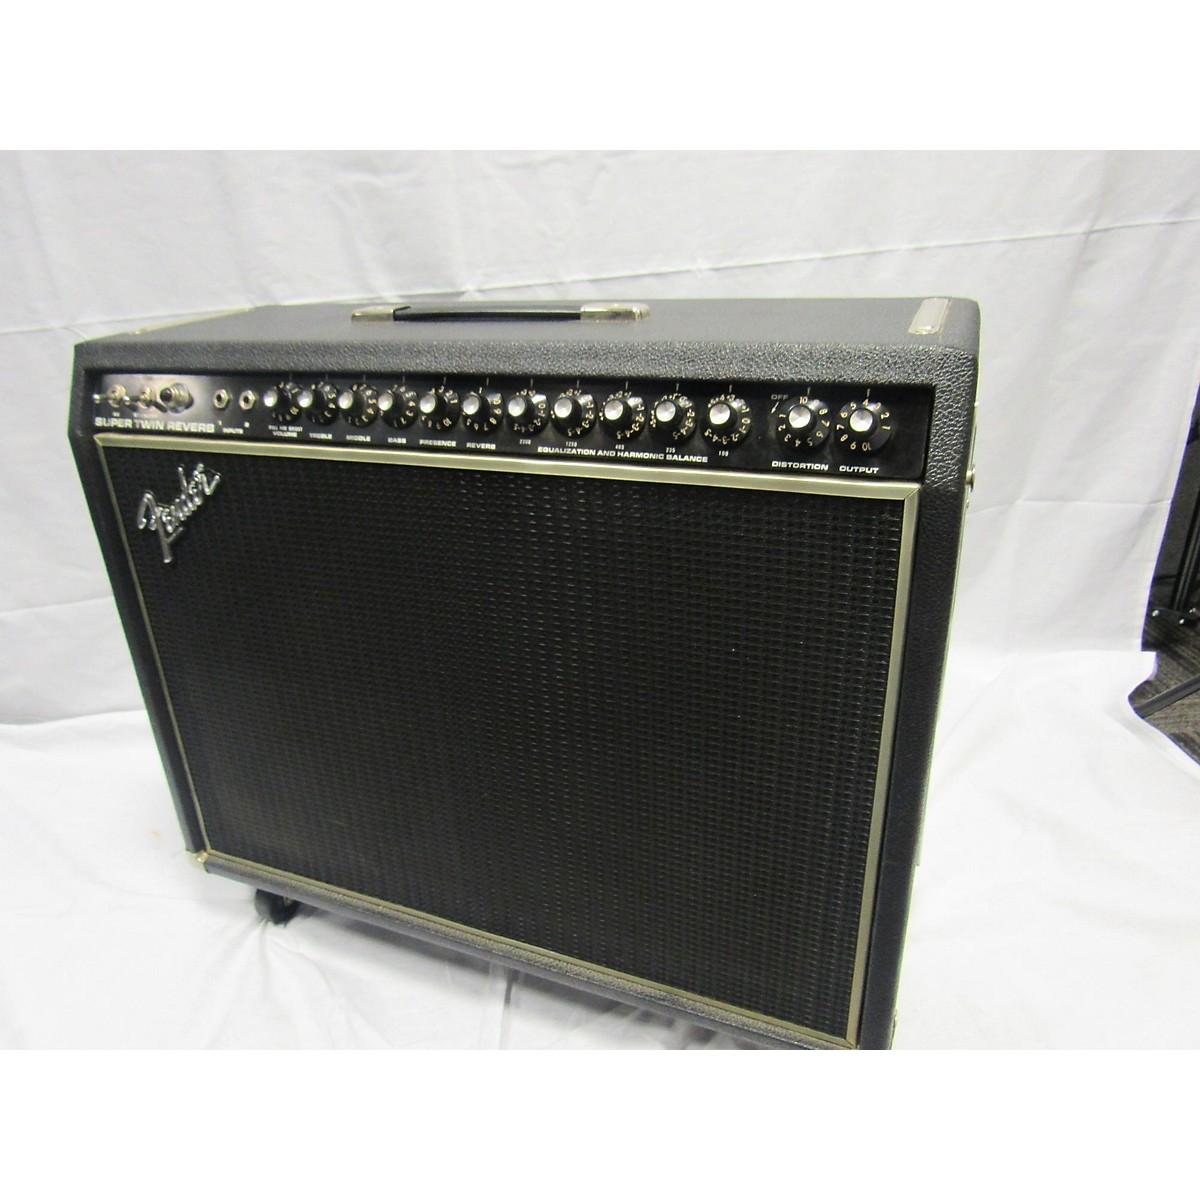 Fender 1972 Super Twin Reverb Tube Guitar Combo Amp